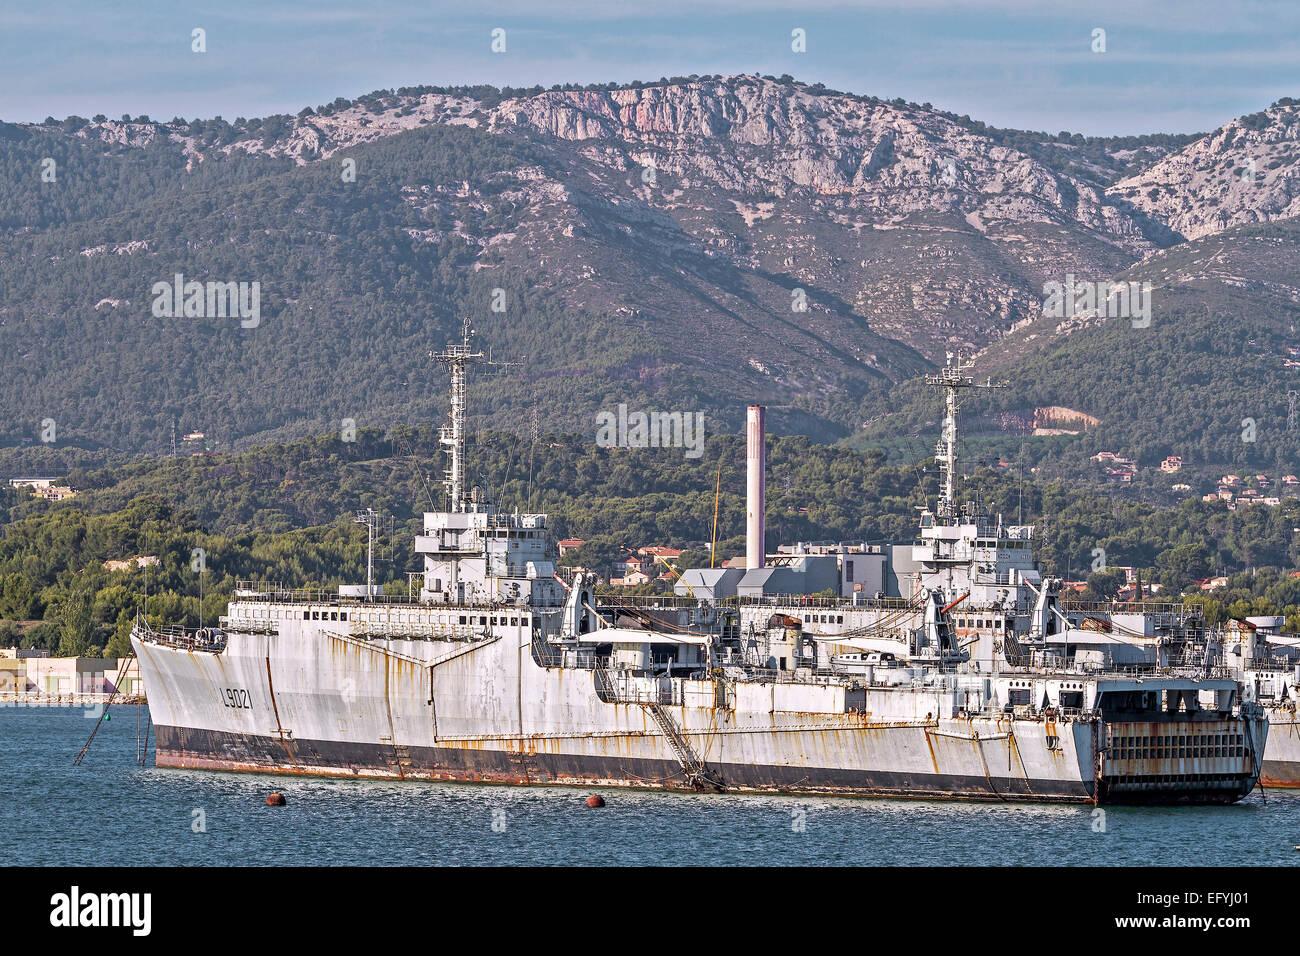 French Navy Ship Ouragan Toulan France - Stock Image